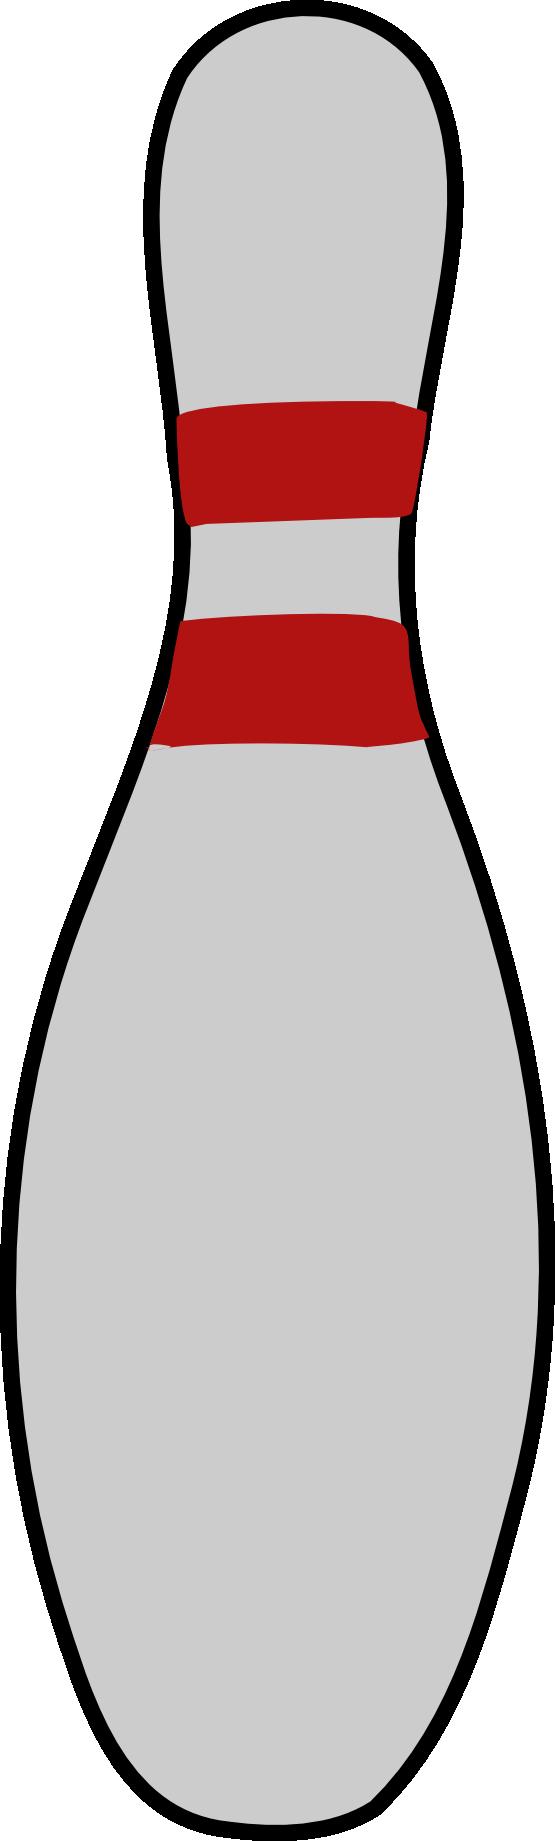 555x1841 Bowling Clipart Pin